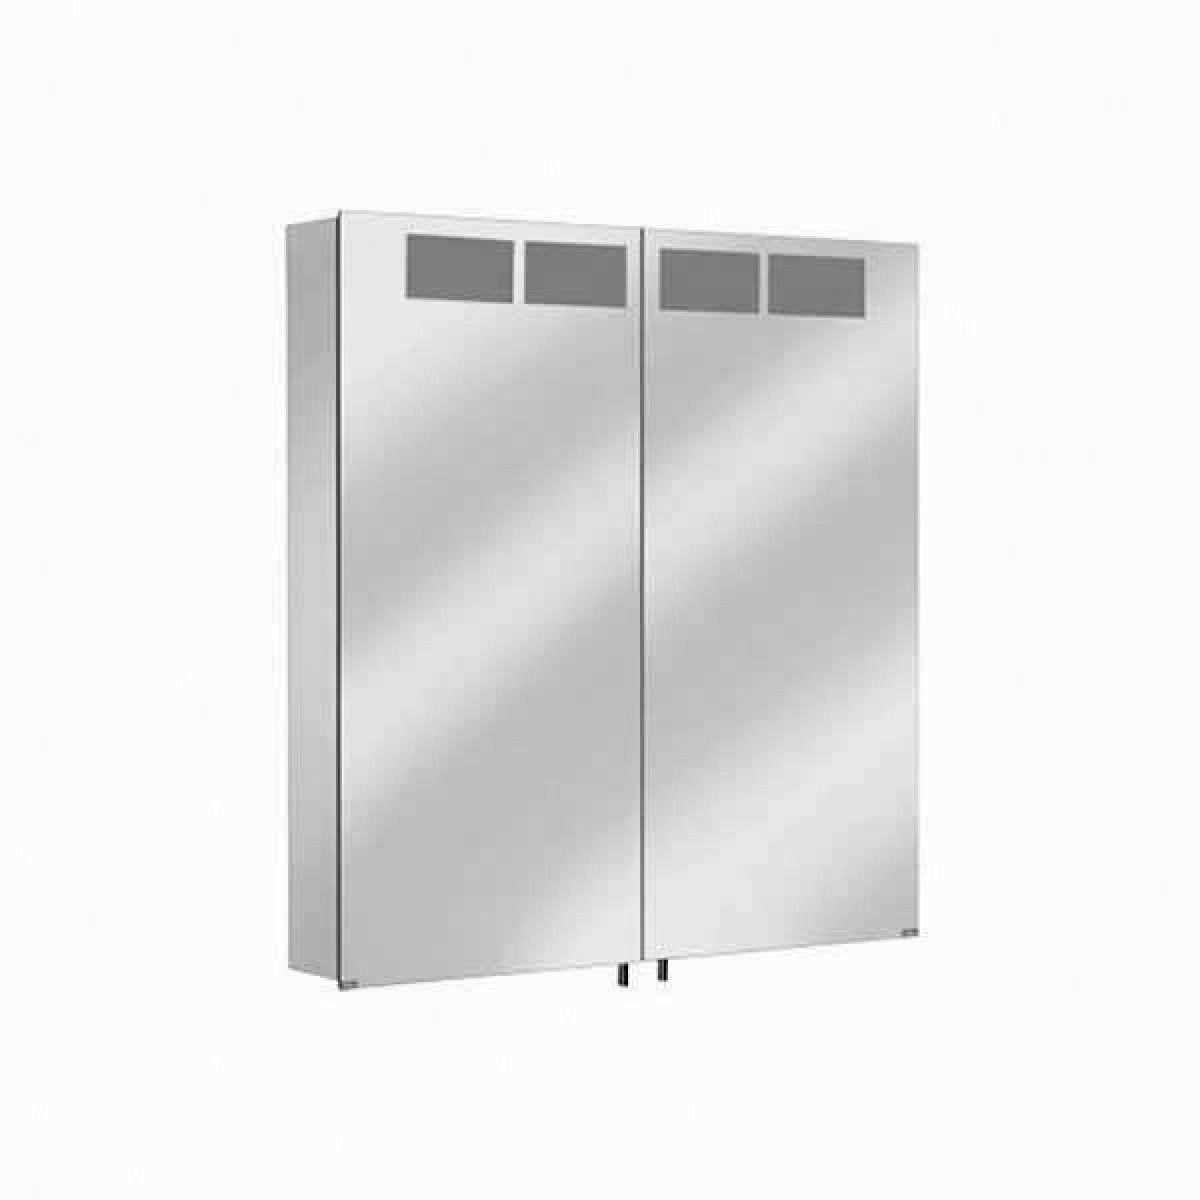 keuco royal t1 mirror cabinet uk bathrooms. Black Bedroom Furniture Sets. Home Design Ideas